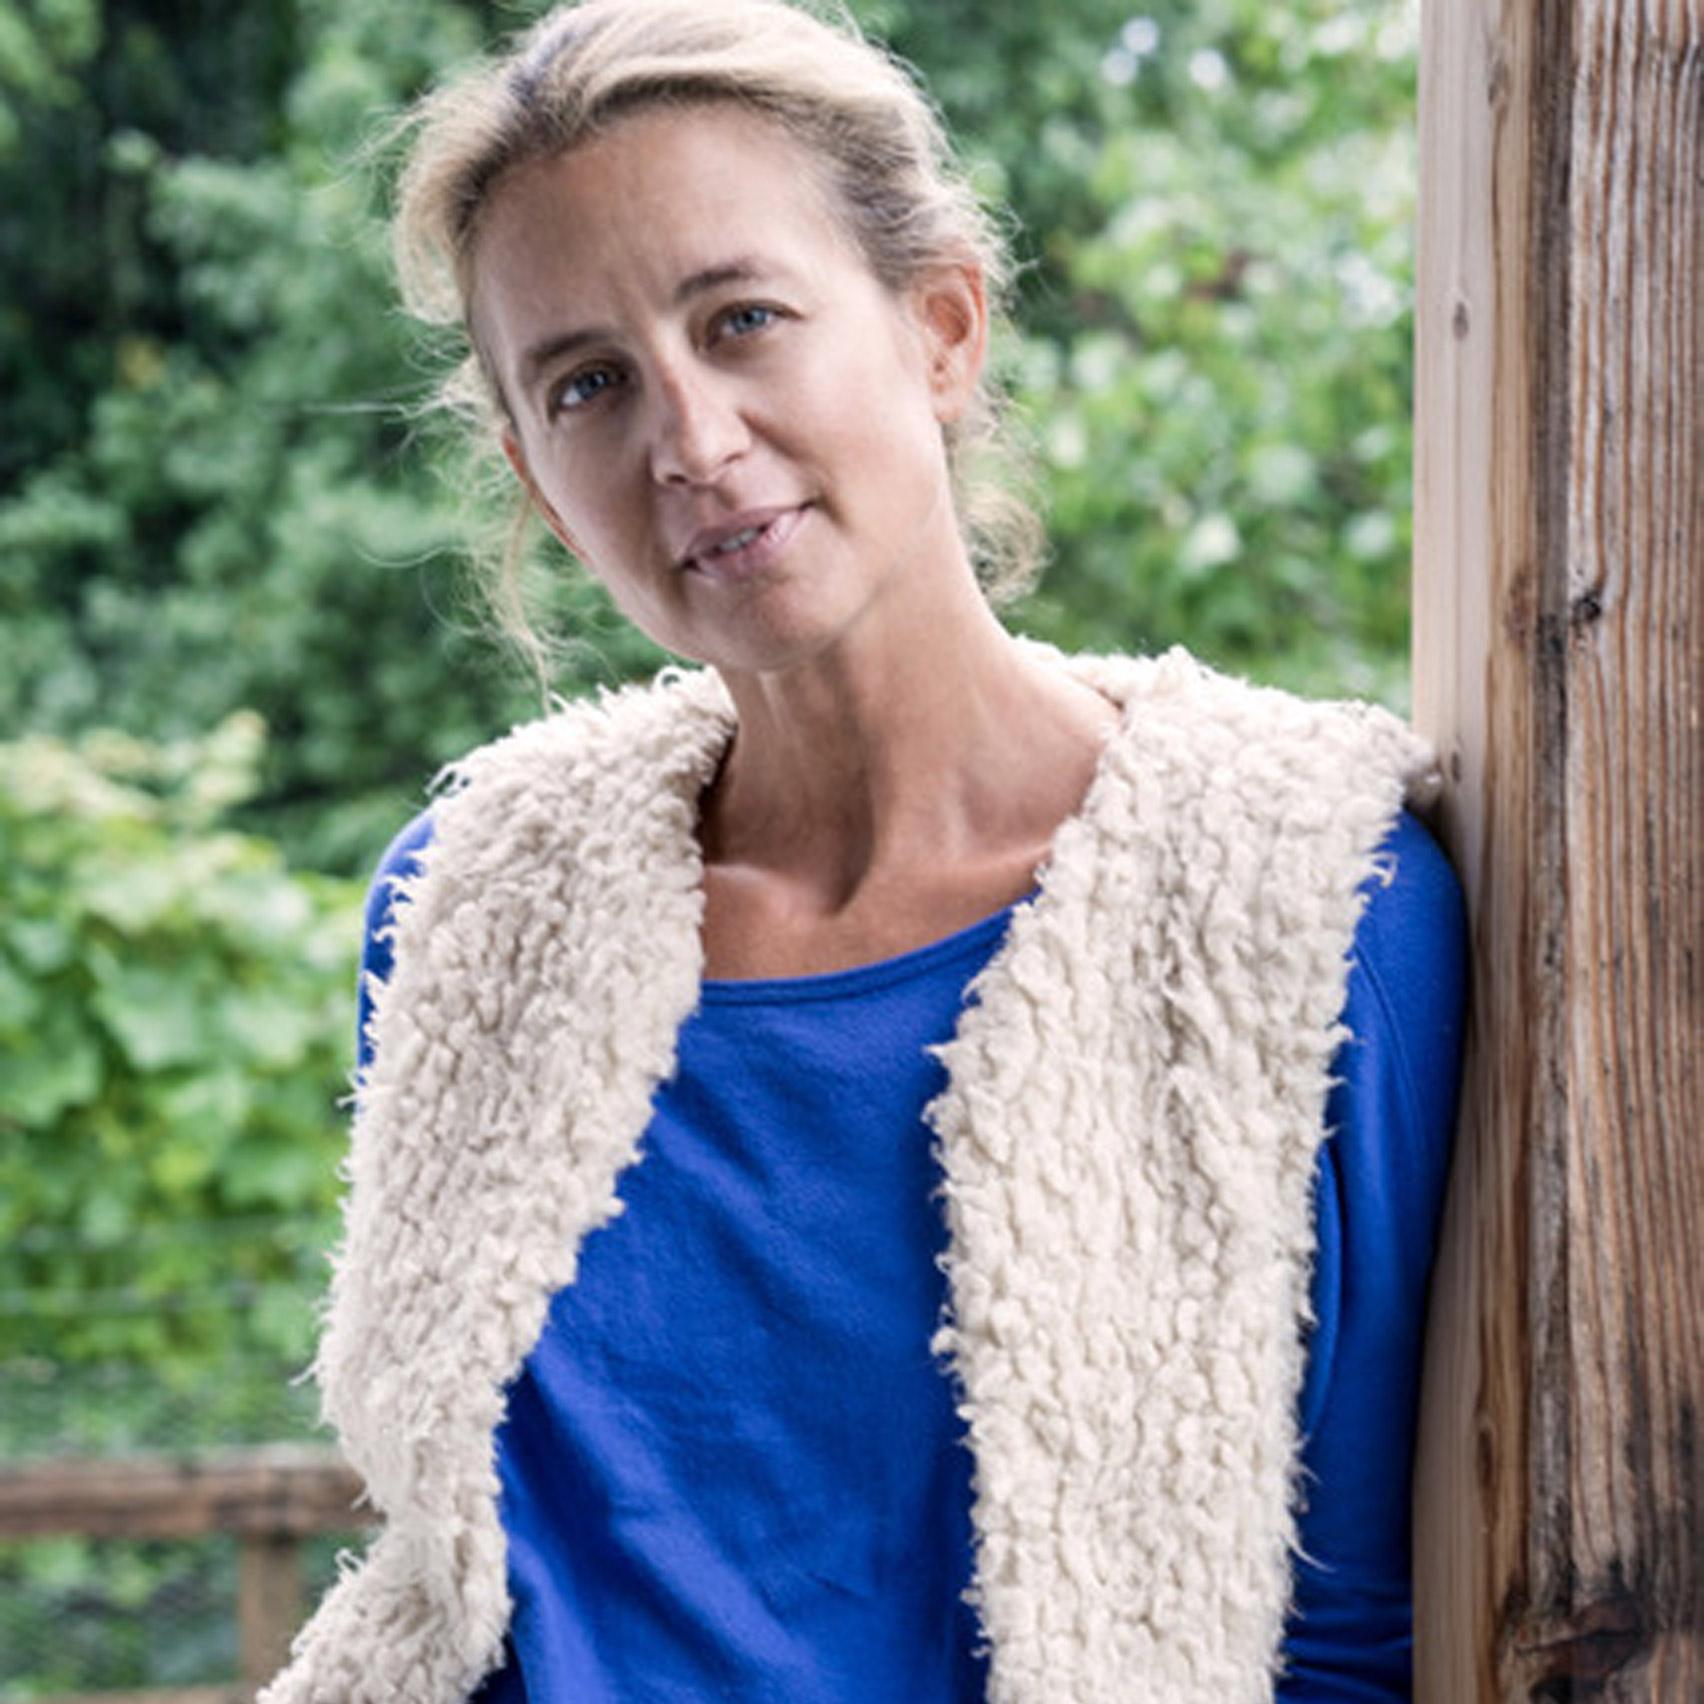 Portrait of photographer Pauline Thurn und Taxis